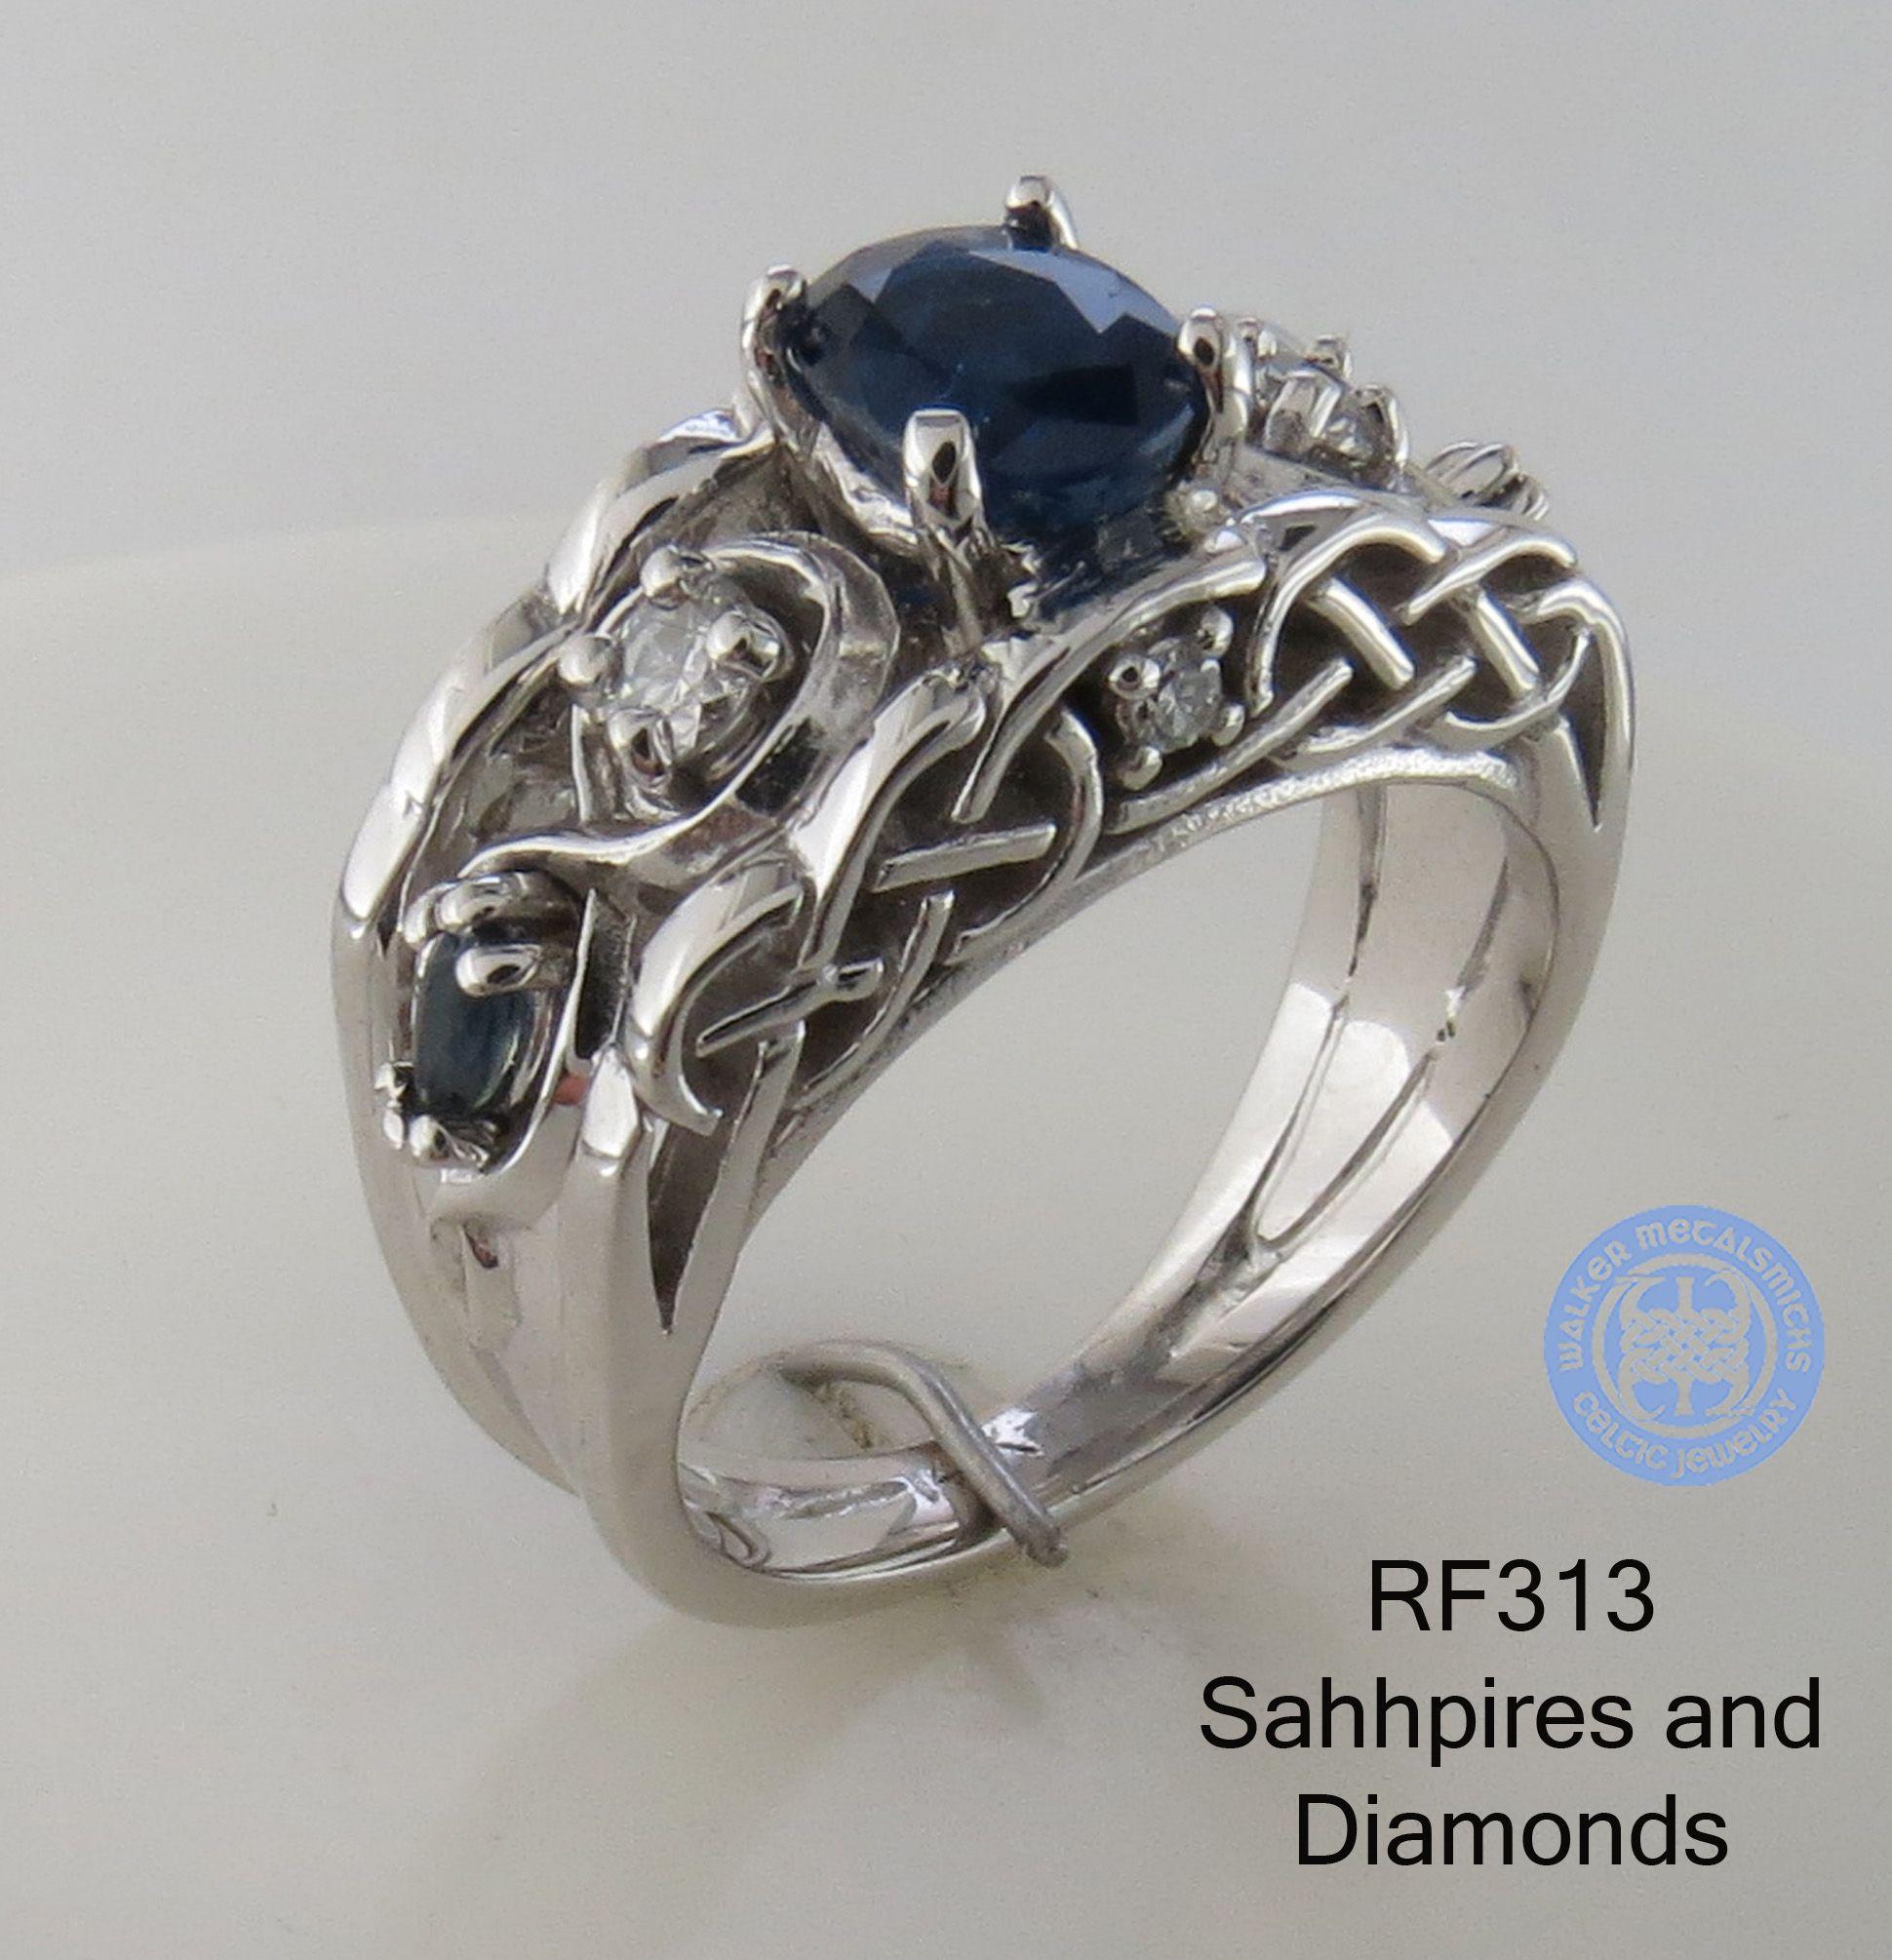 Unique Celtic Irish Engagement Wedding Ring In 14k White Gold With Diamonds And Sapphi Celtic Wedding Rings Wedding Rings Engagement Celtic Wedding Rings Irish